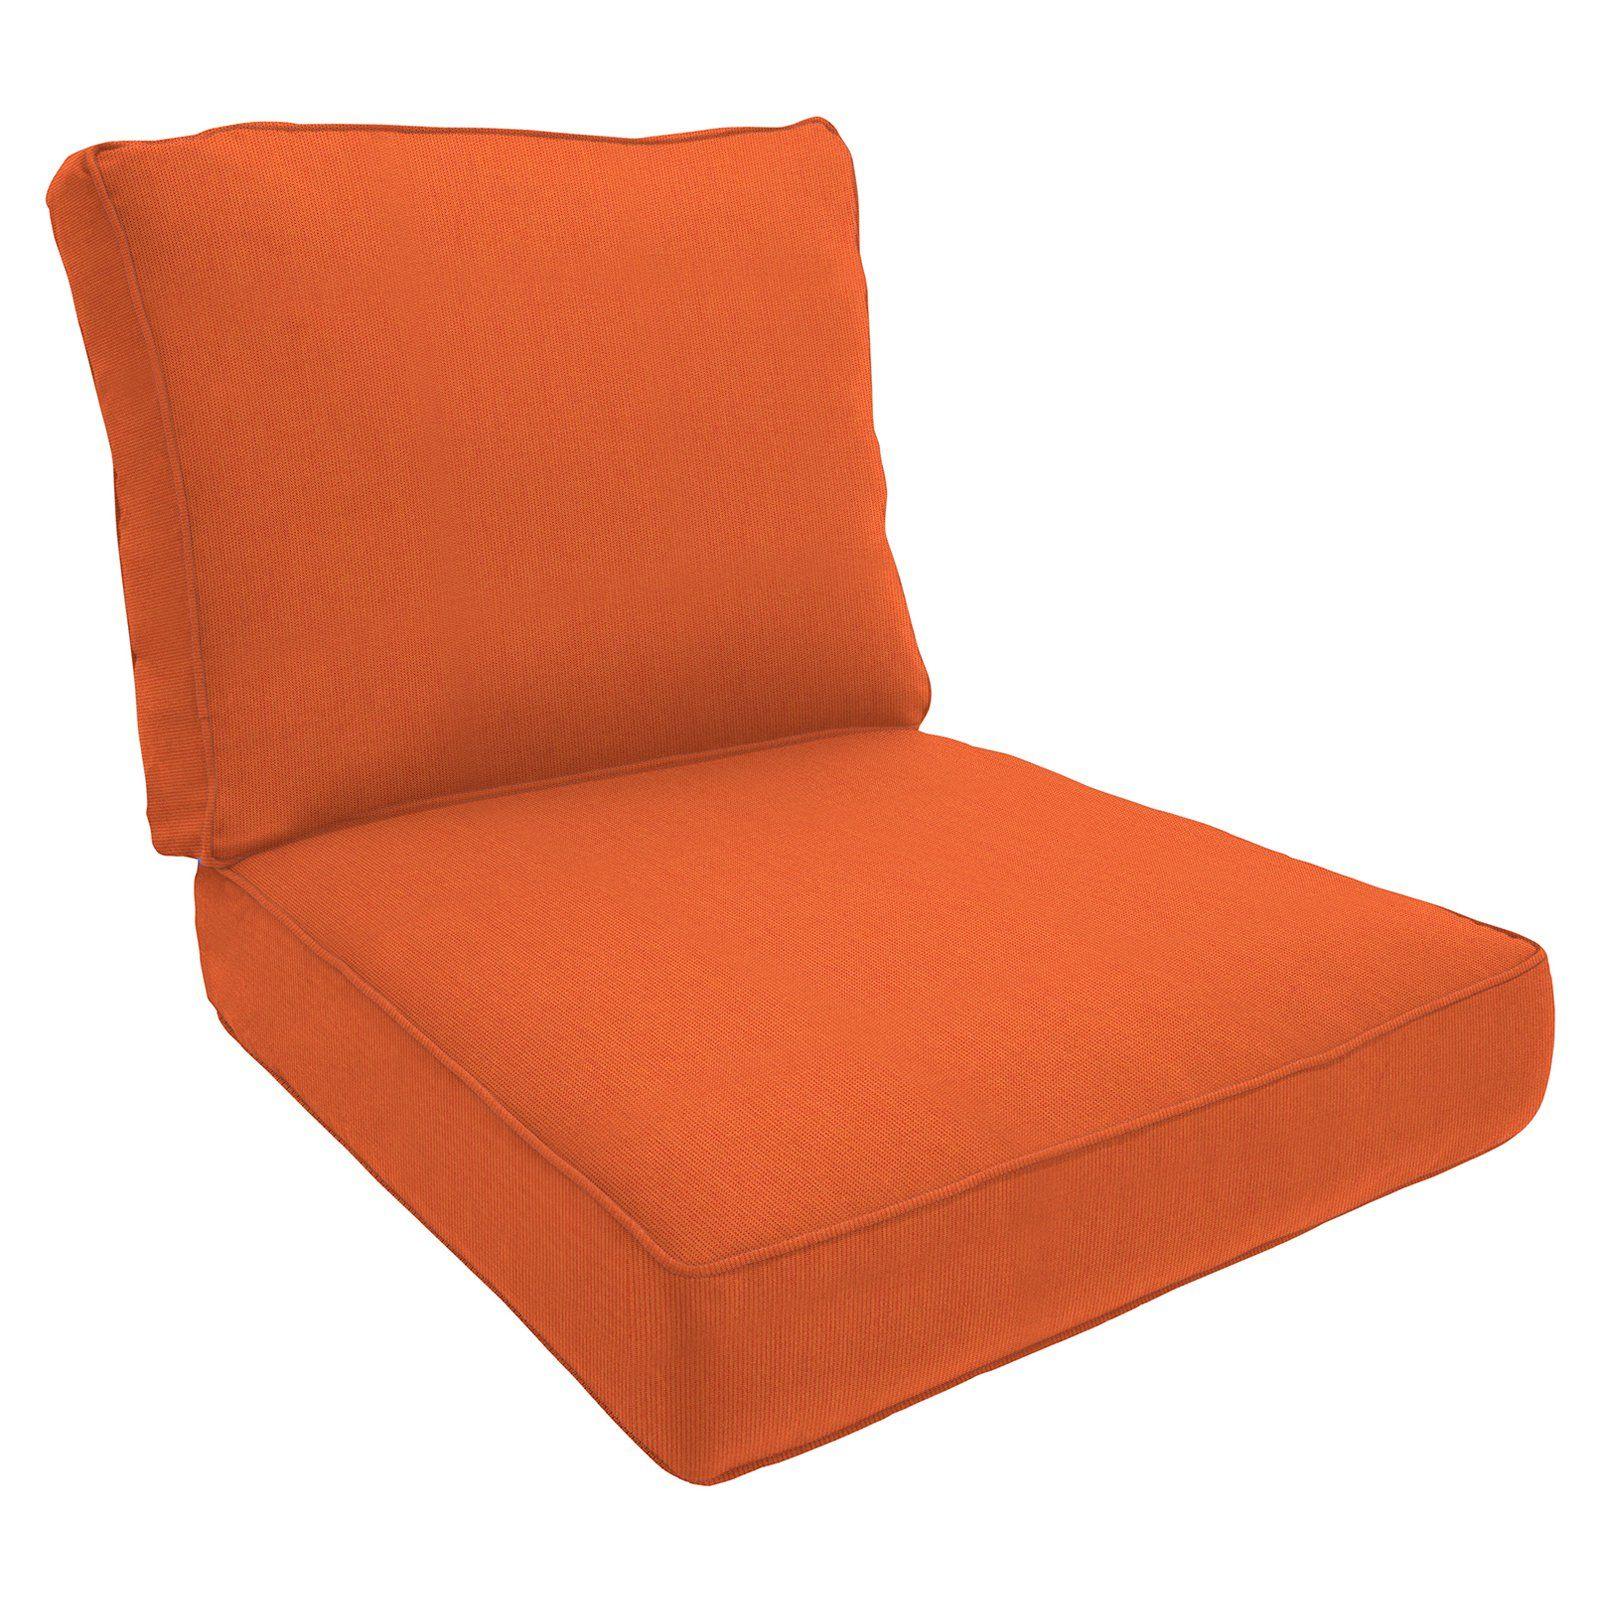 Magnificent Eddie Bauer Sunbrella Deep Seating Lounge Chair Cushion Pdpeps Interior Chair Design Pdpepsorg